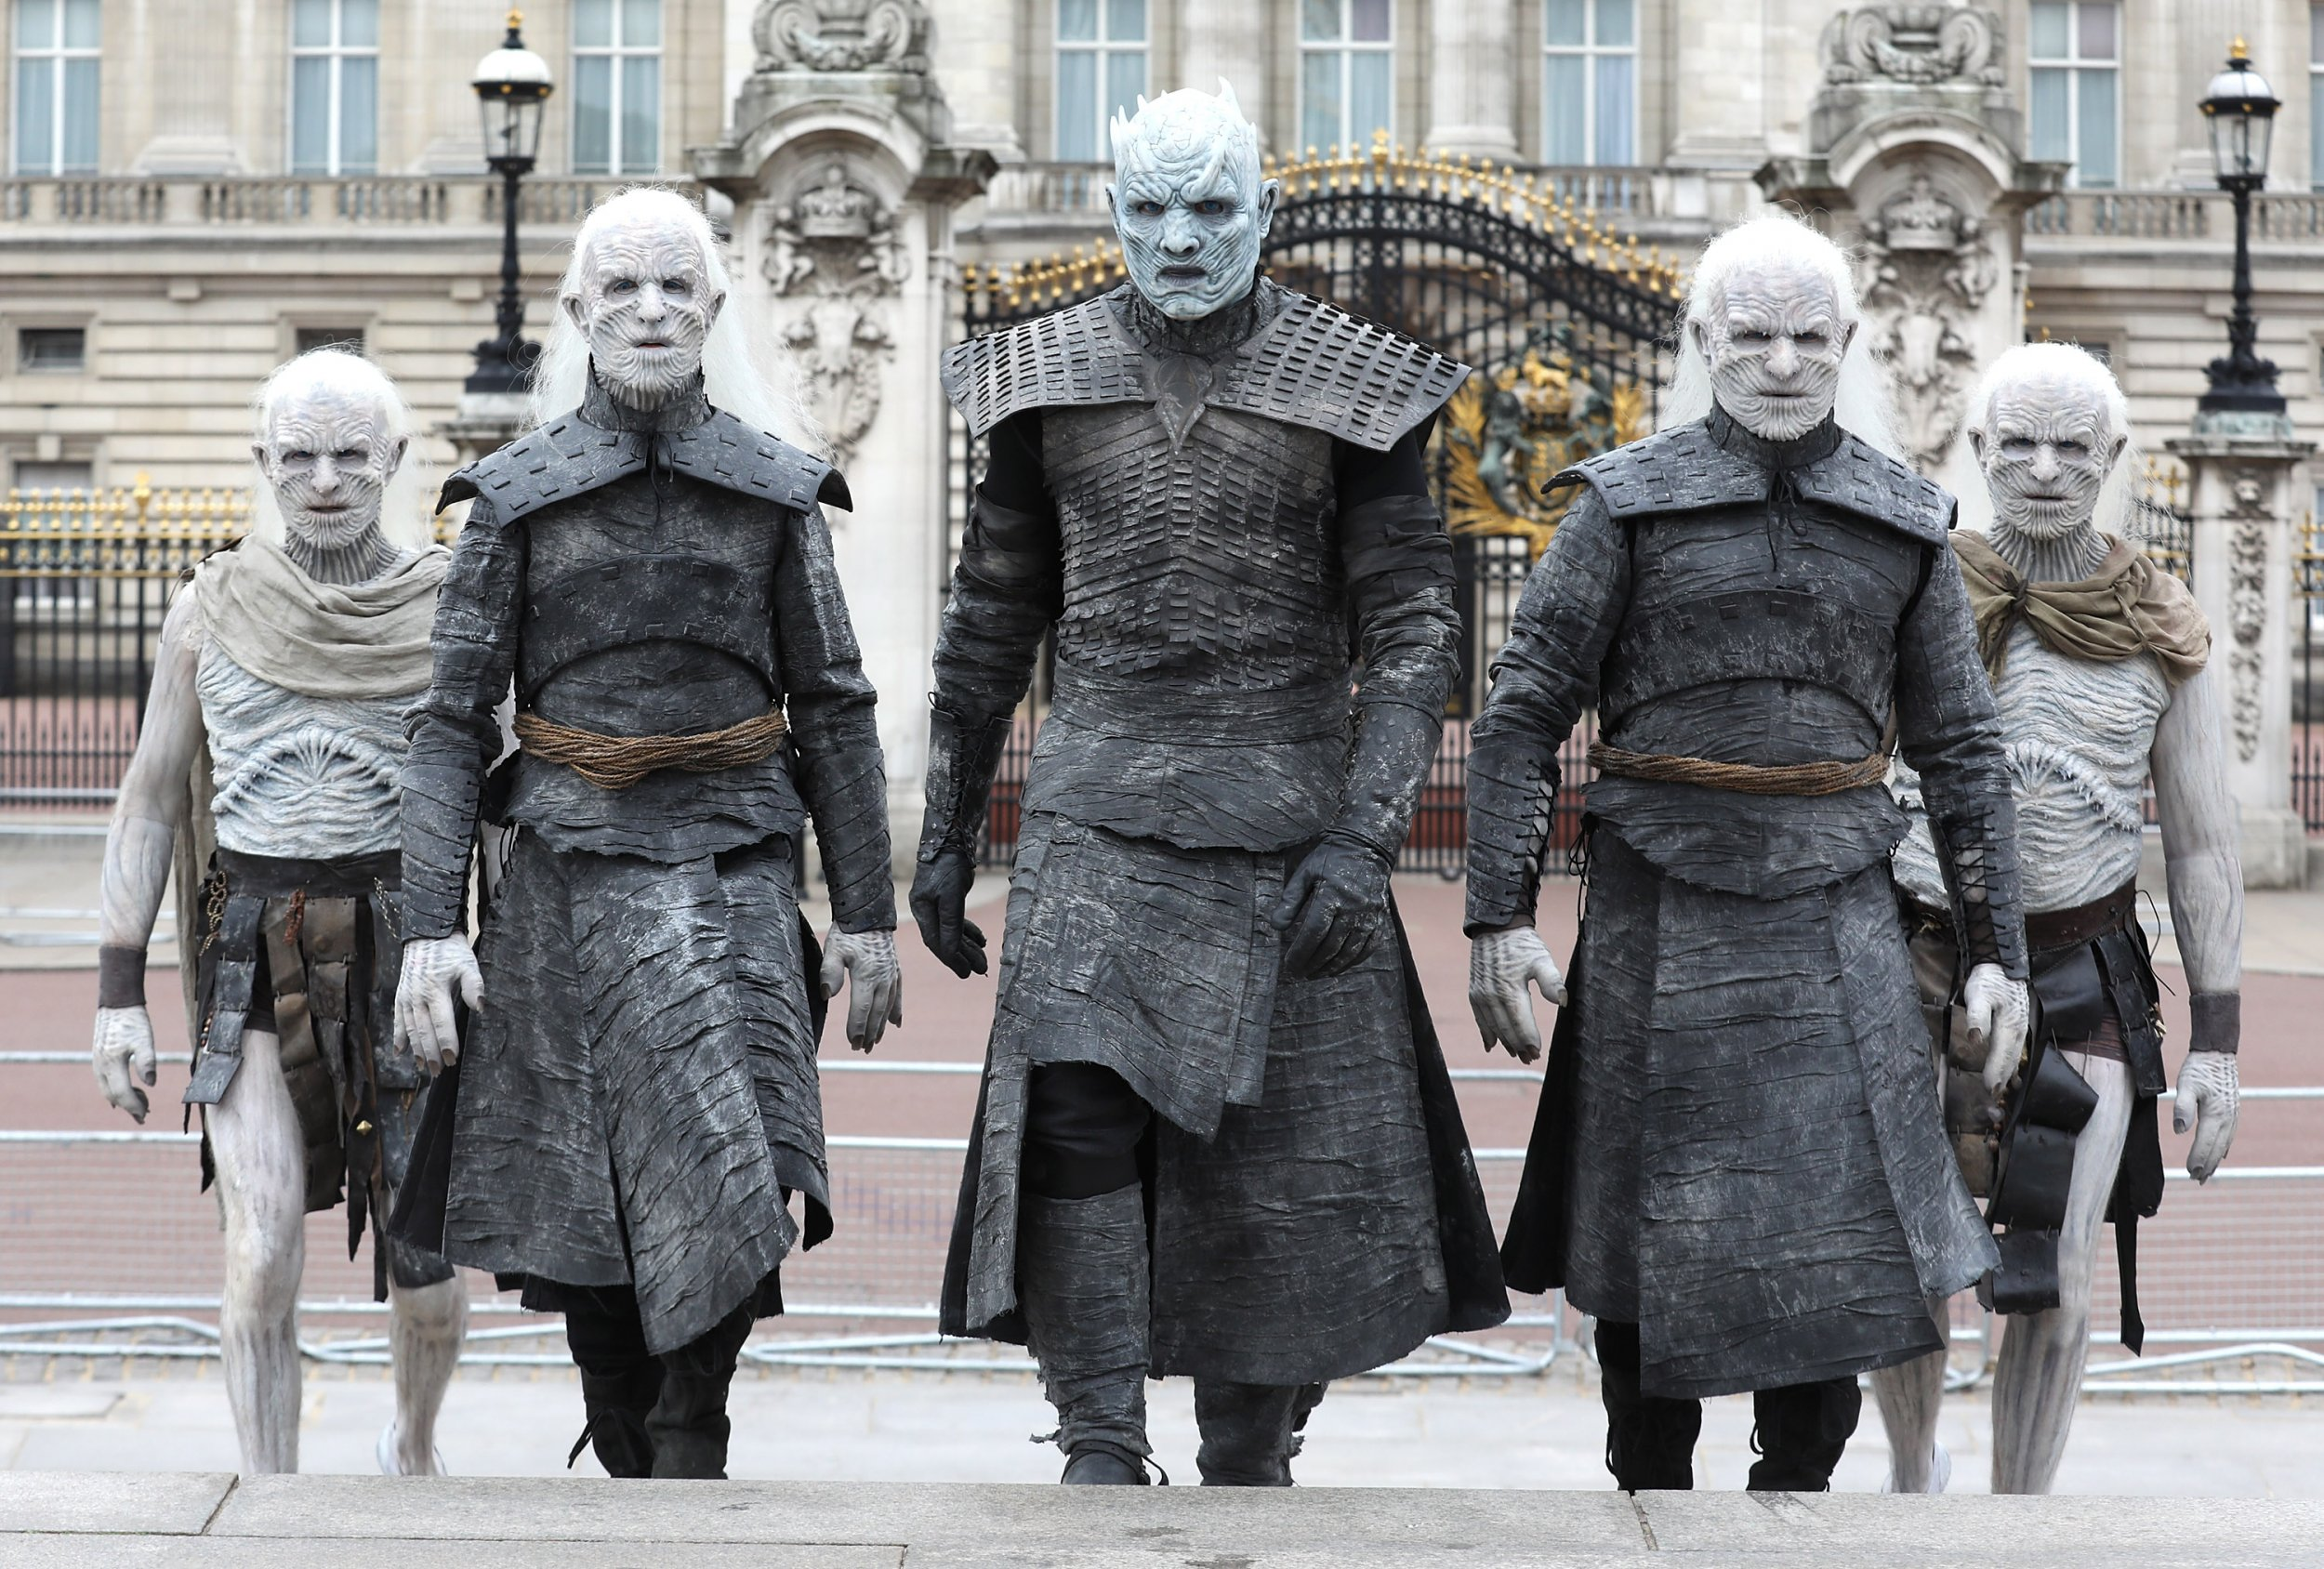 Game of Thrones, Deaths, Season 8, Final Season, Lannisters, Starks, Iron Throne